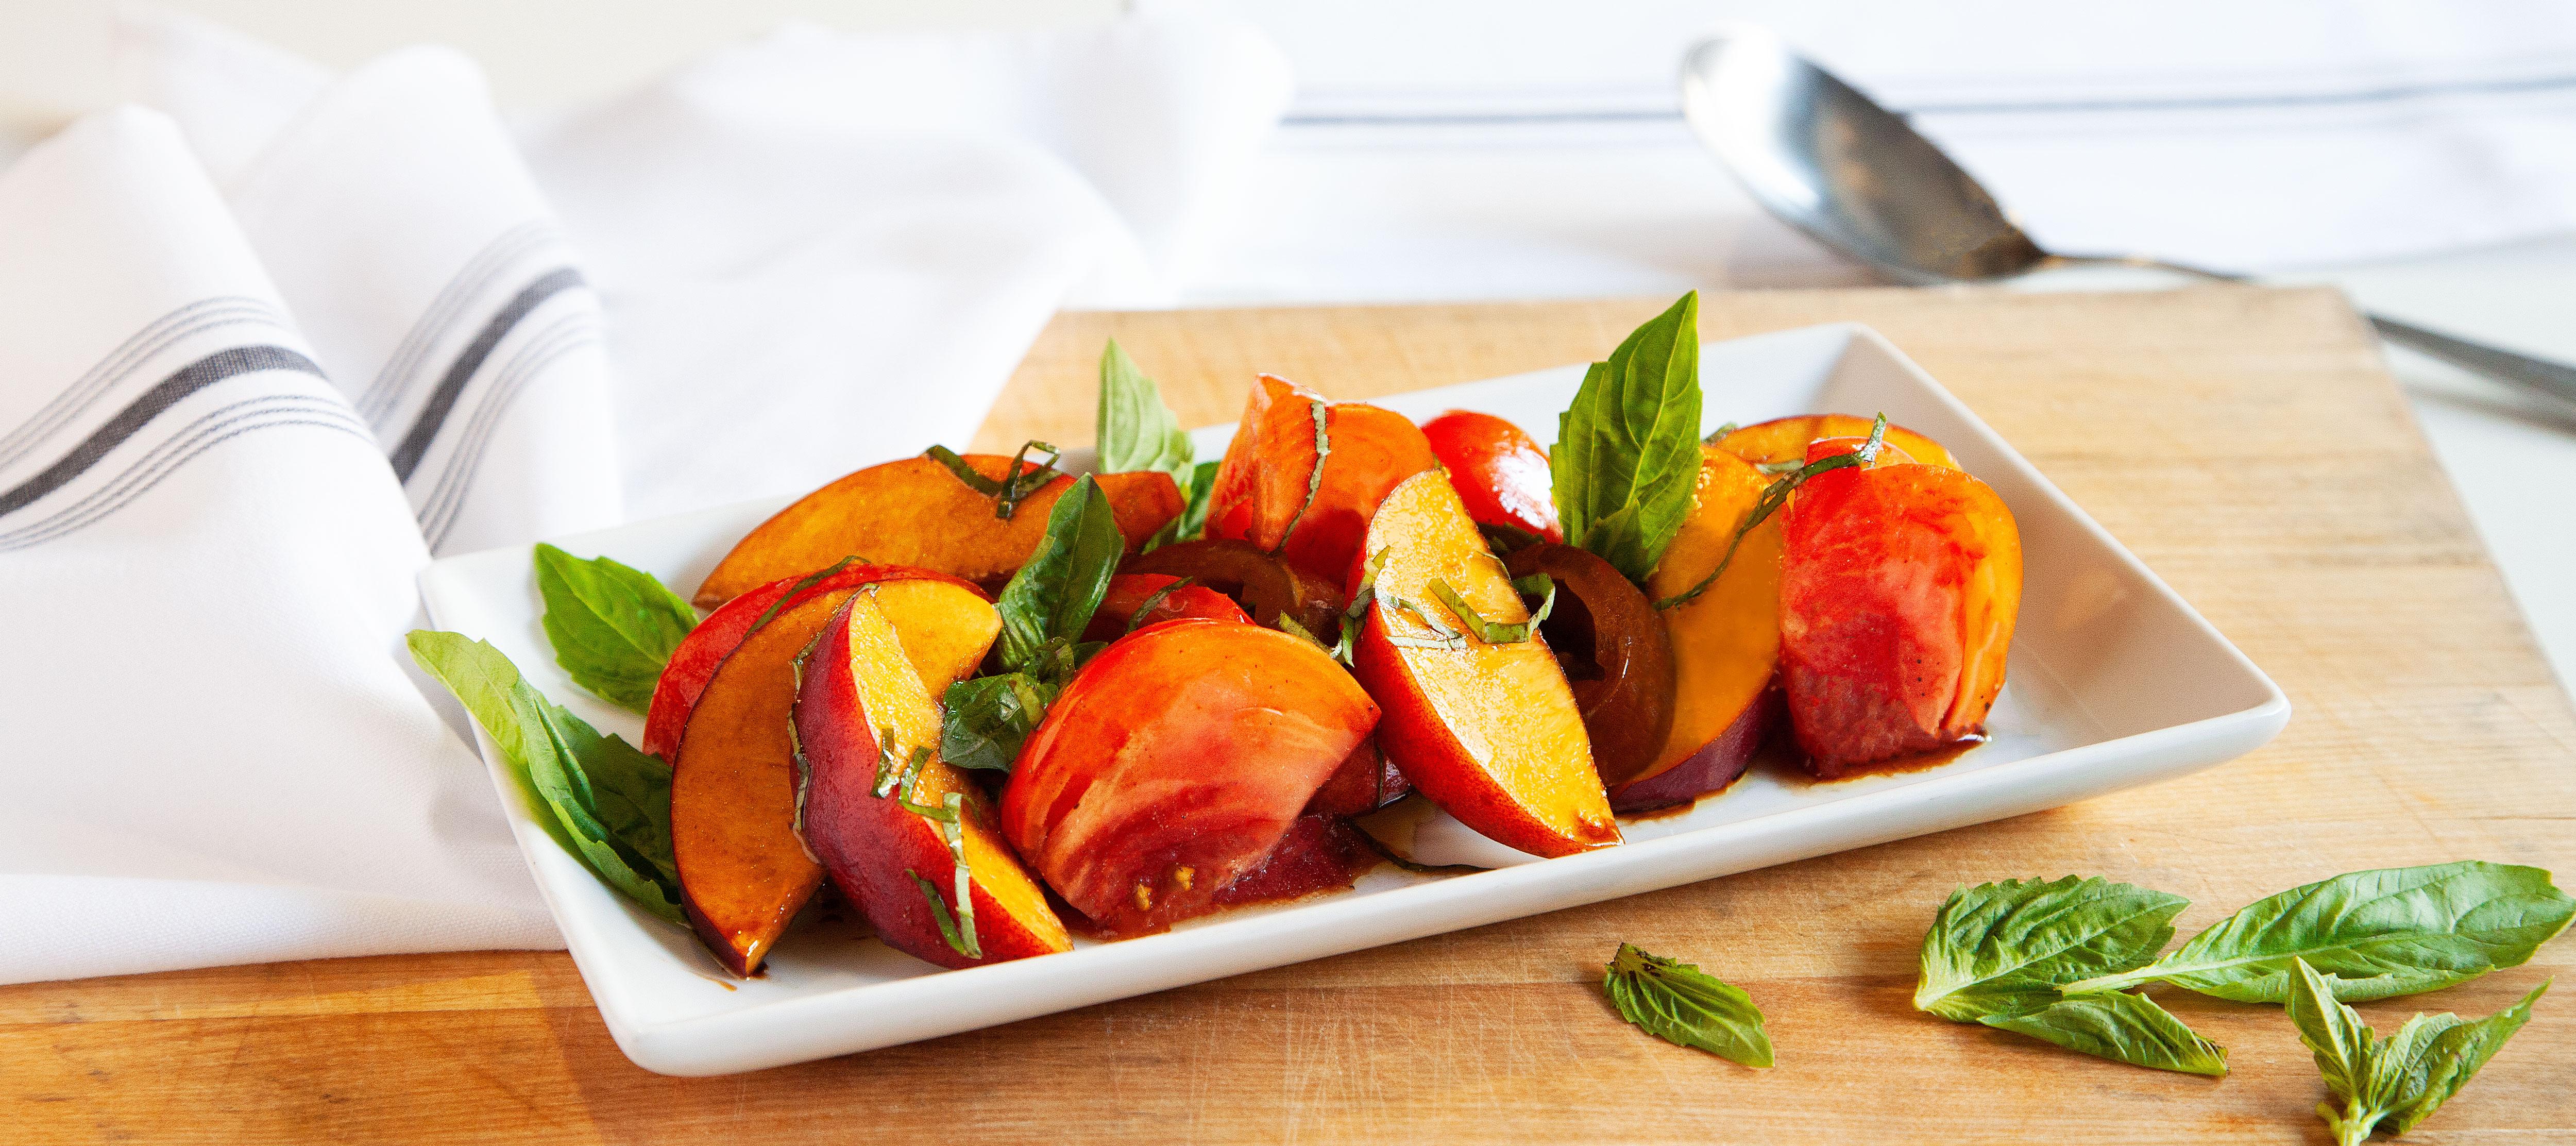 Tomato, Peach and Basil Salad with Balsamic Vinegar